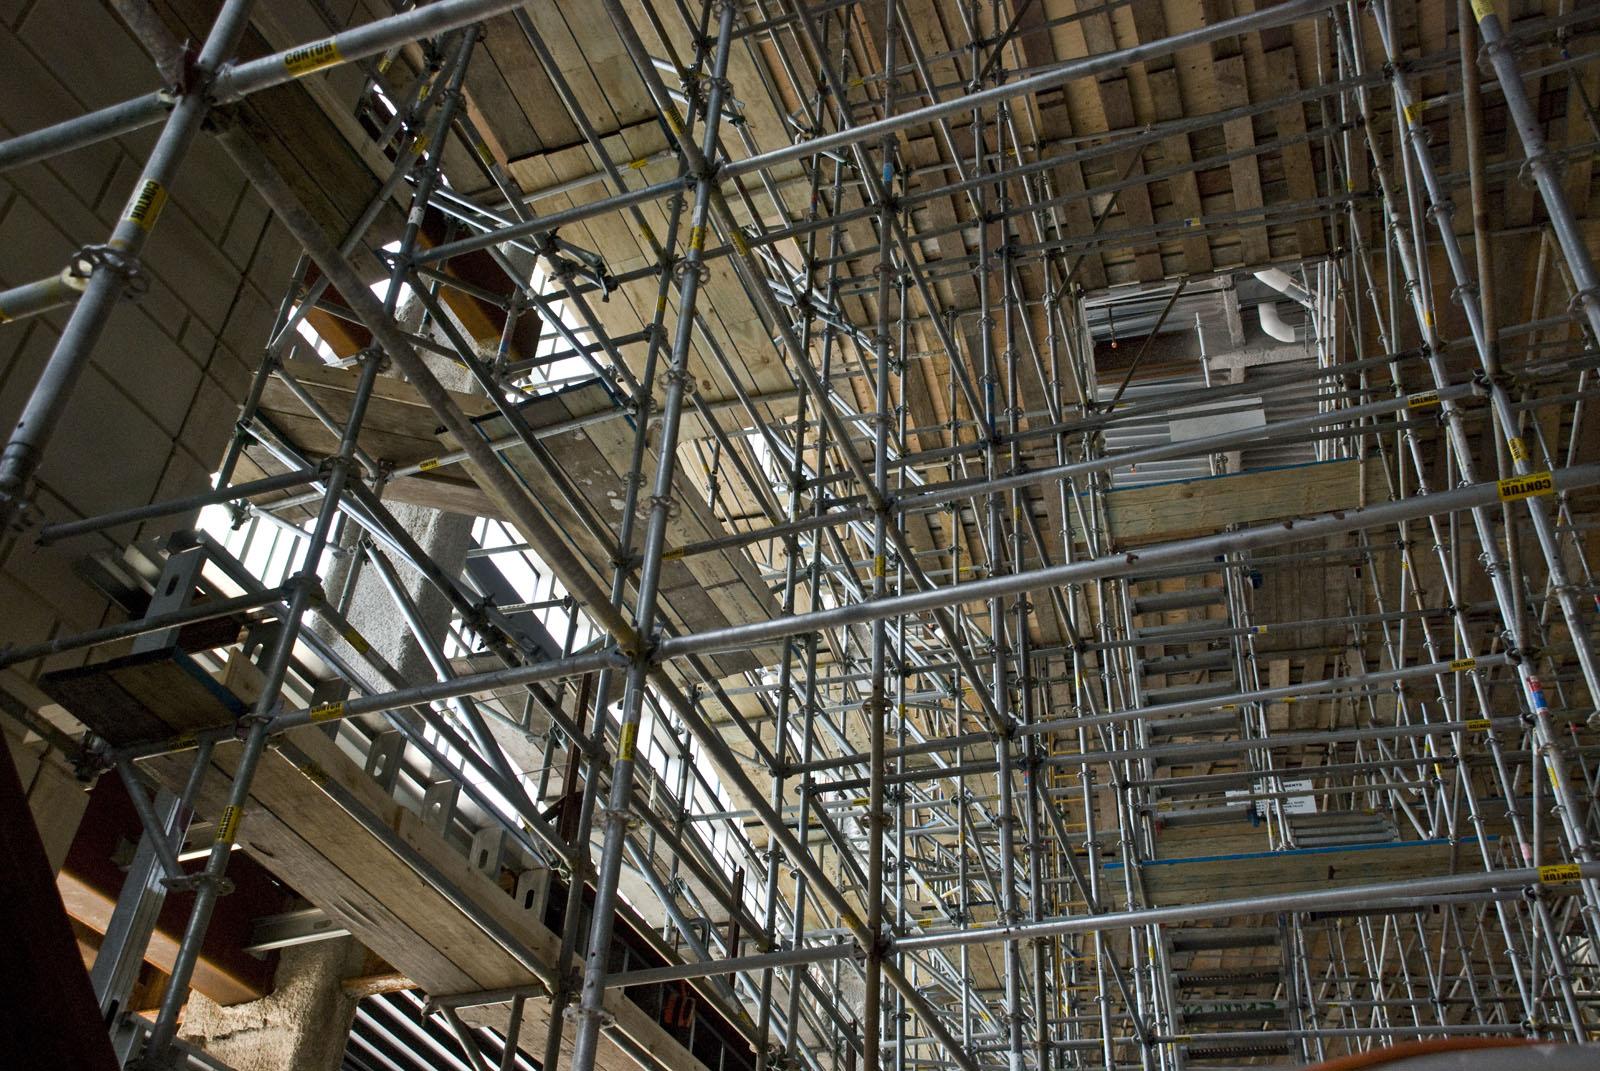 scaffold-rent-scaffolding-superior-scaffold-system-scaffold-atrium-hospital-nj-new-jersey-72